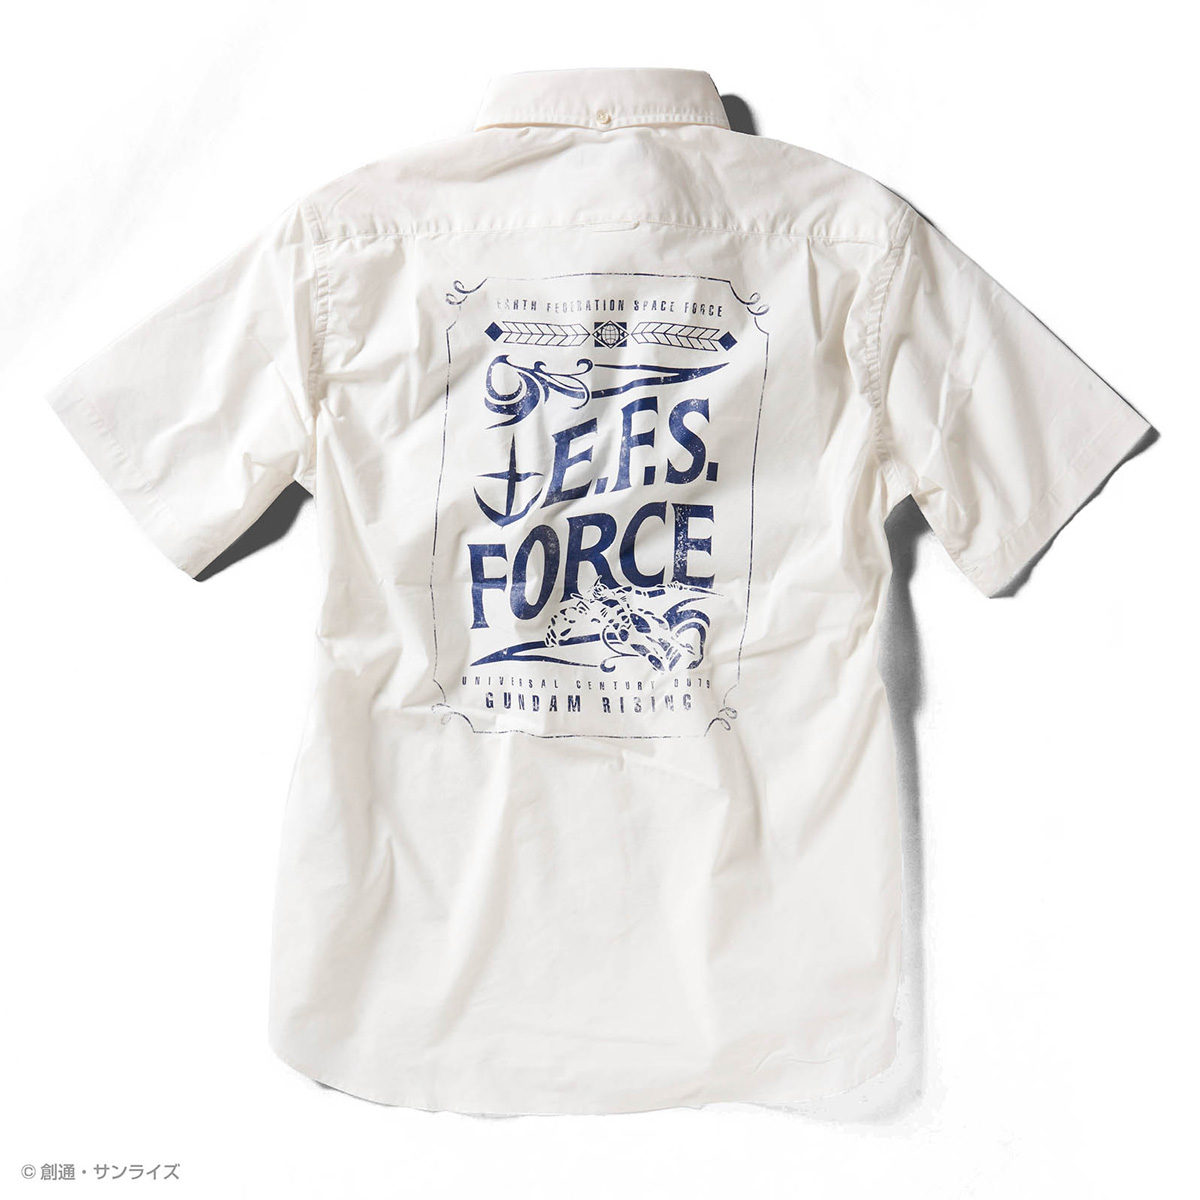 STRICT-G『機動戦士ガンダム』 クールマックス 半袖ボタンダウンPt.シャツ E.F.S.F.